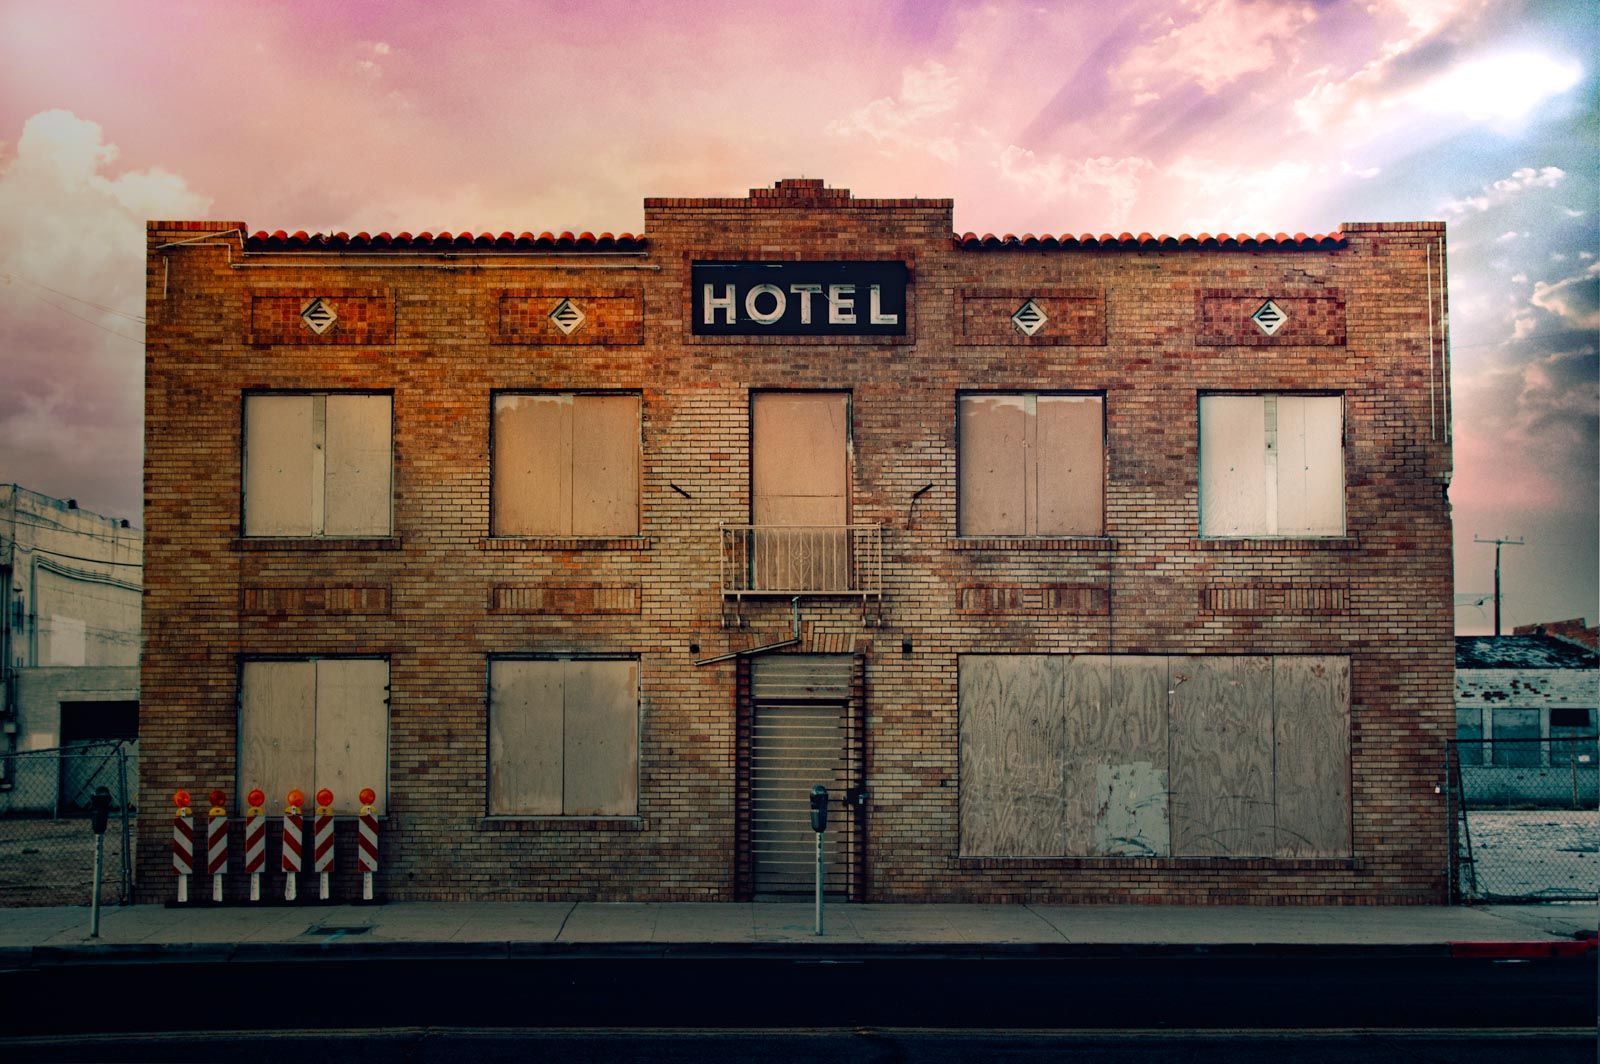 St. James Hotel in downtown Phoenix